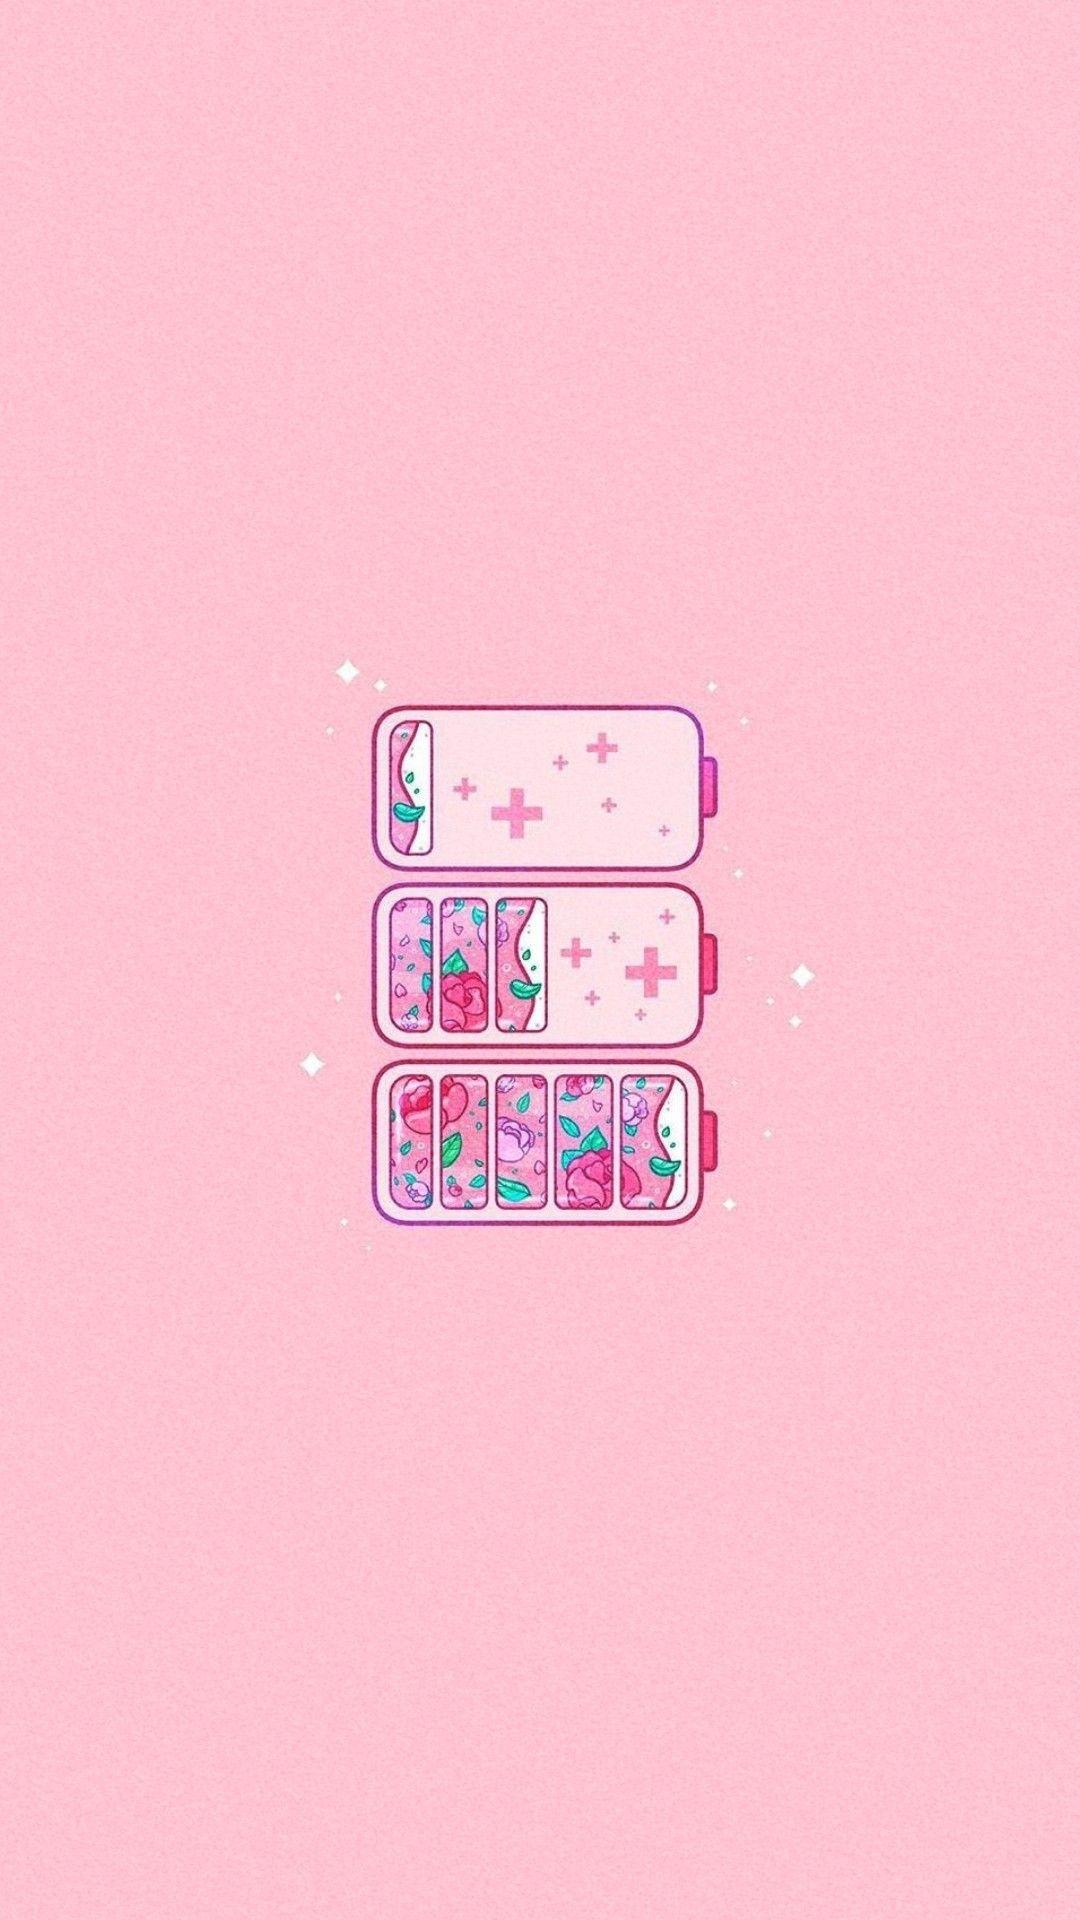 Aesthetic Wallpaper In 2021 Pink Wallpaper Anime Cute Pastel Wallpaper Anime Backgrounds Wallpapers Anime pink wallpaper iphone